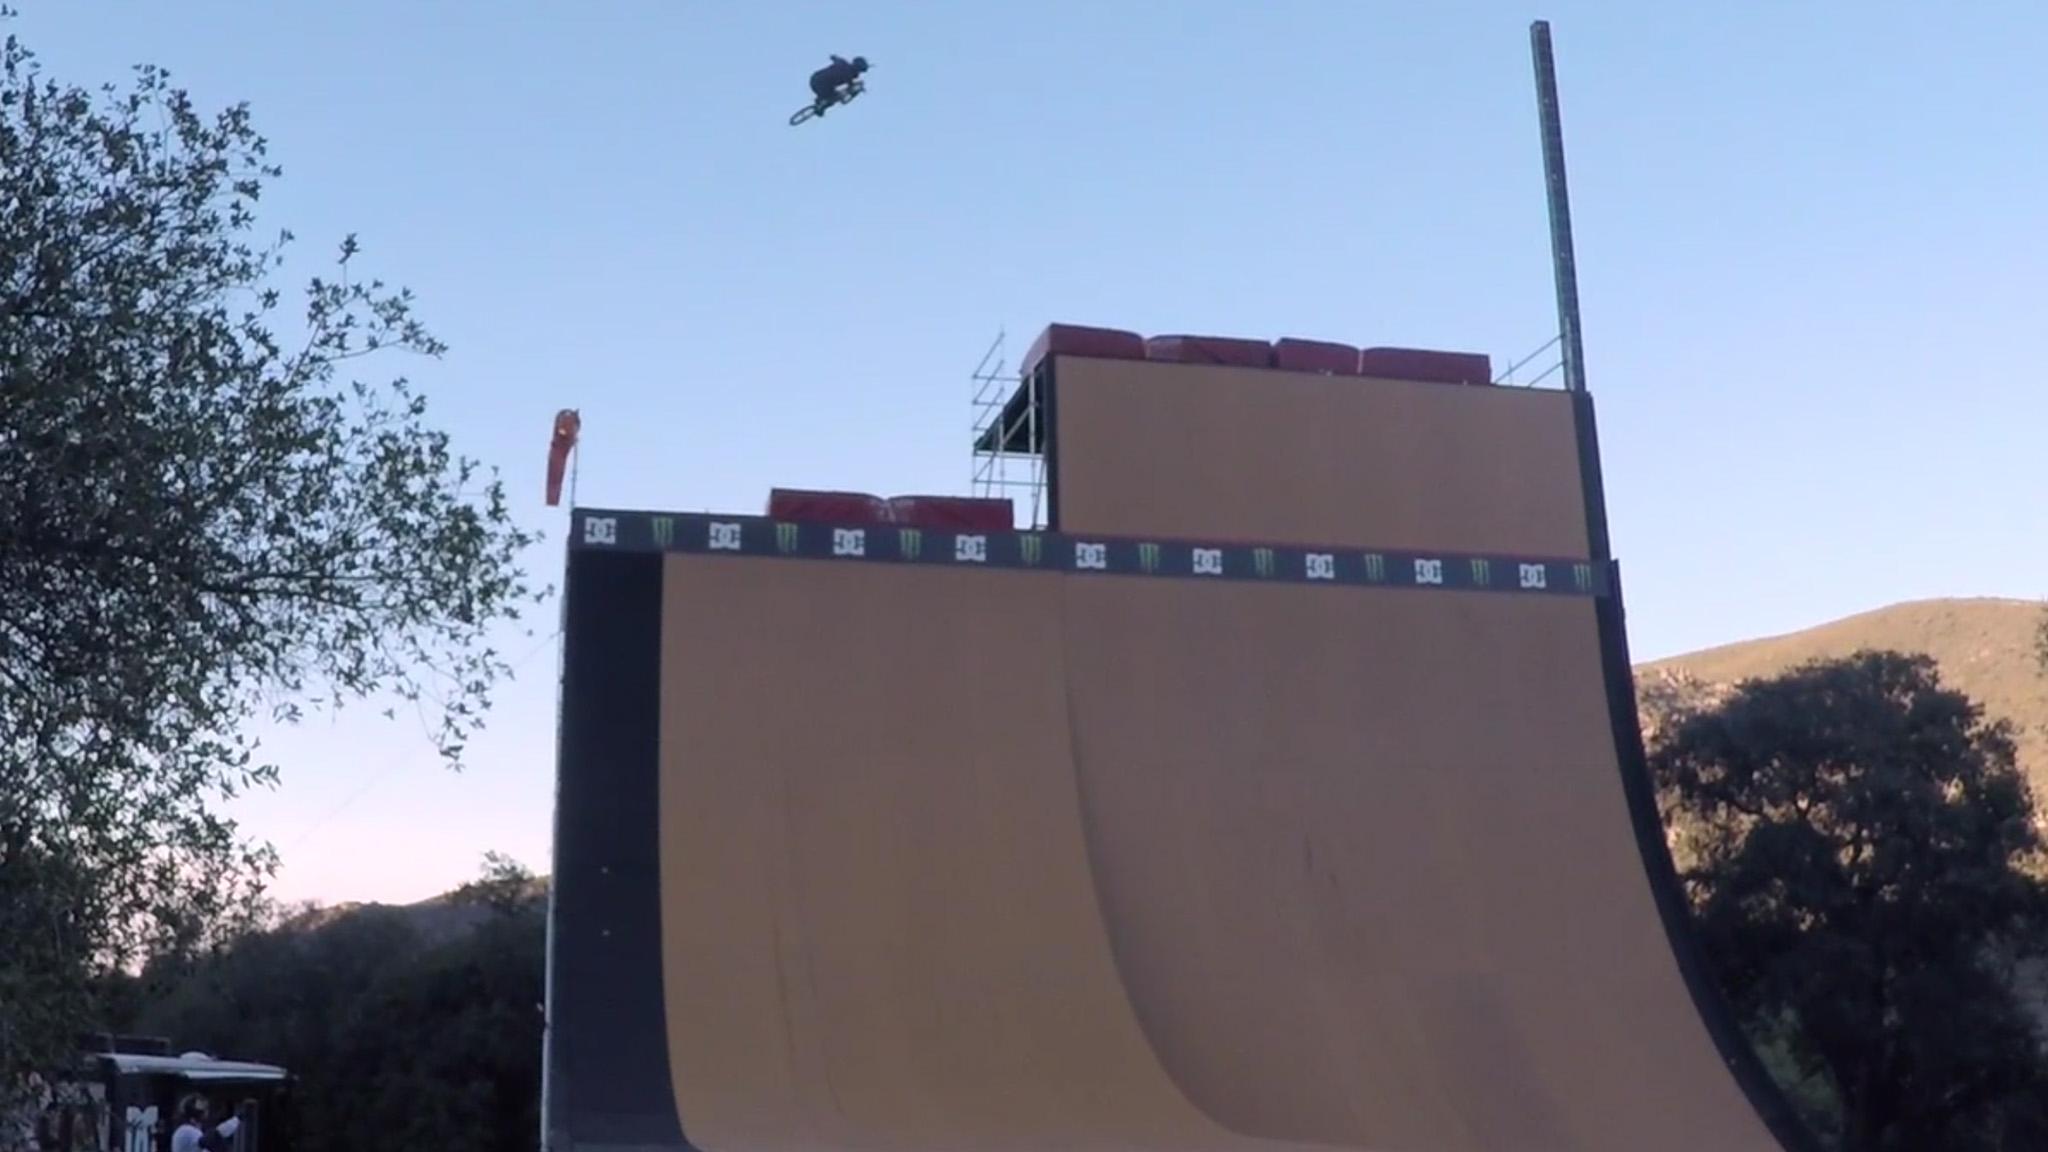 Hoffman high air on Way's ramp